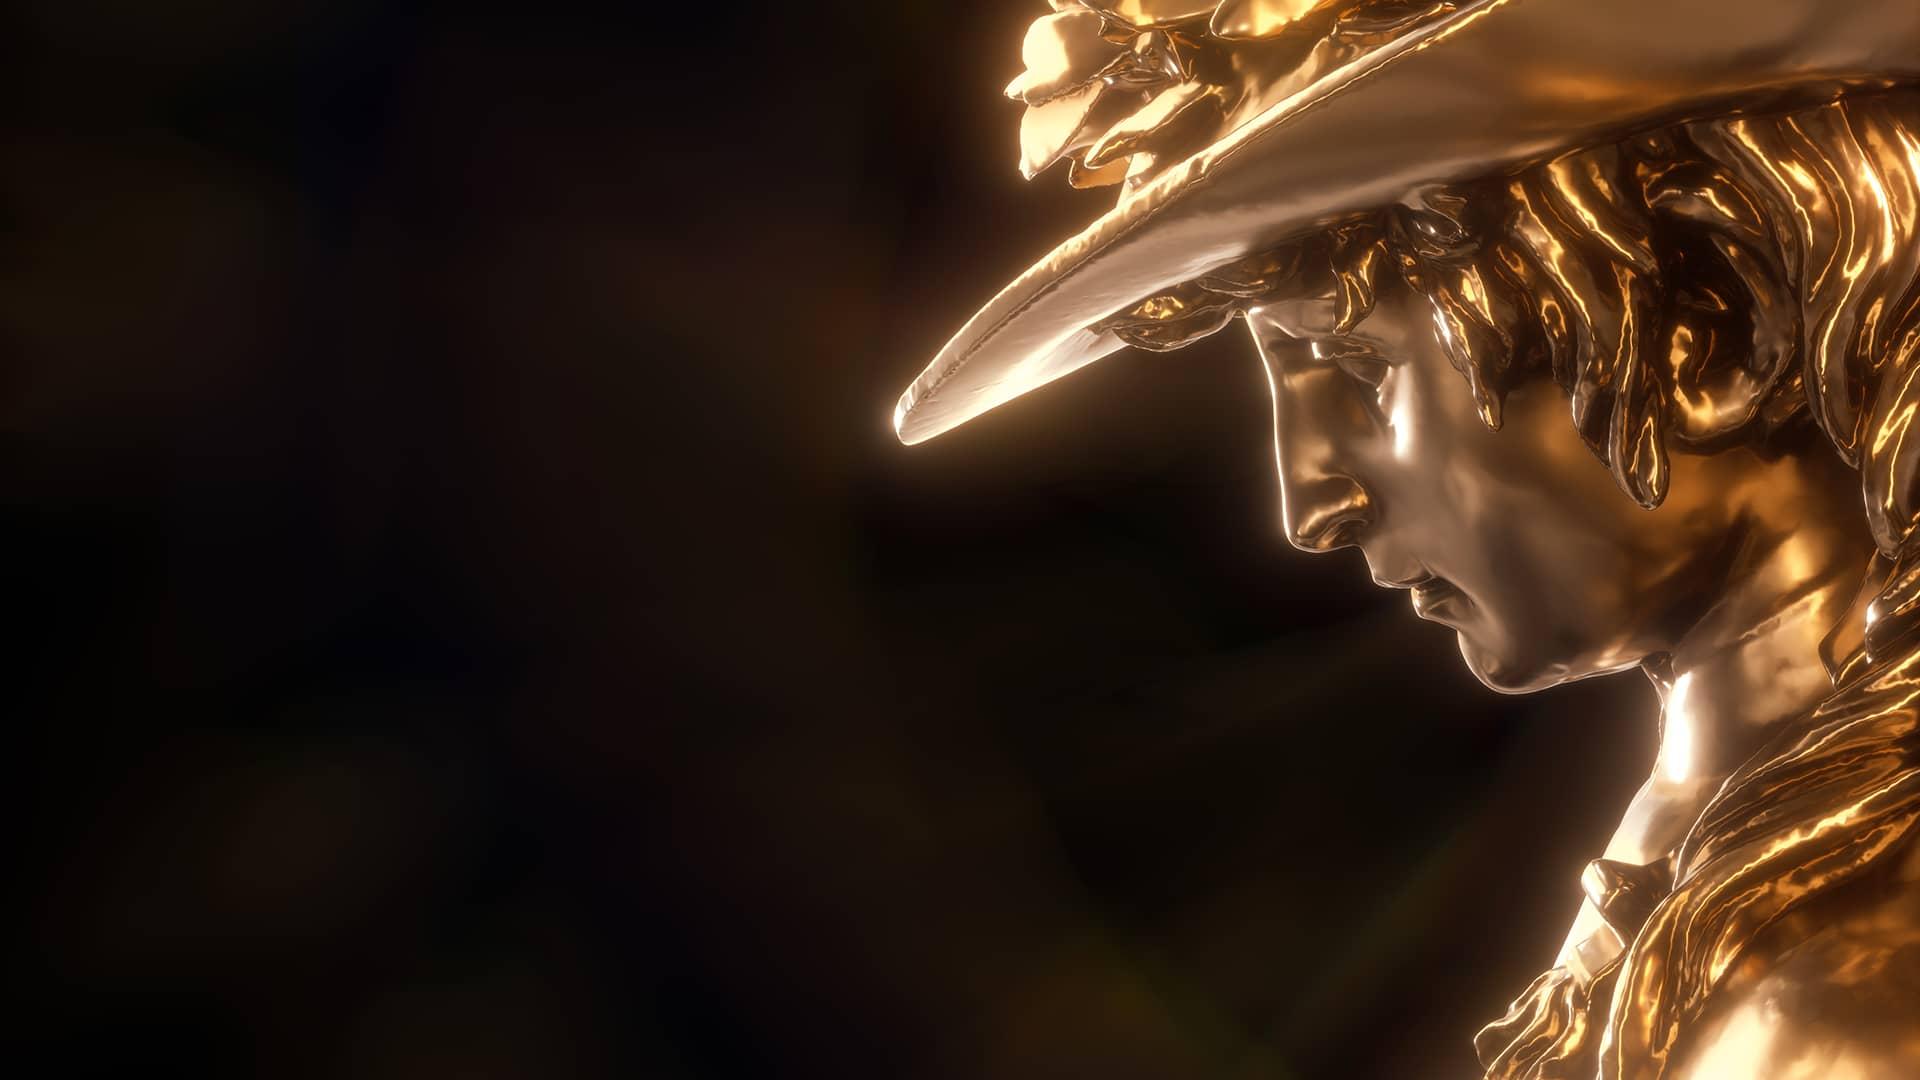 Golden Globe 2019: tutti i vincitori - David di Donatello 1920x1080